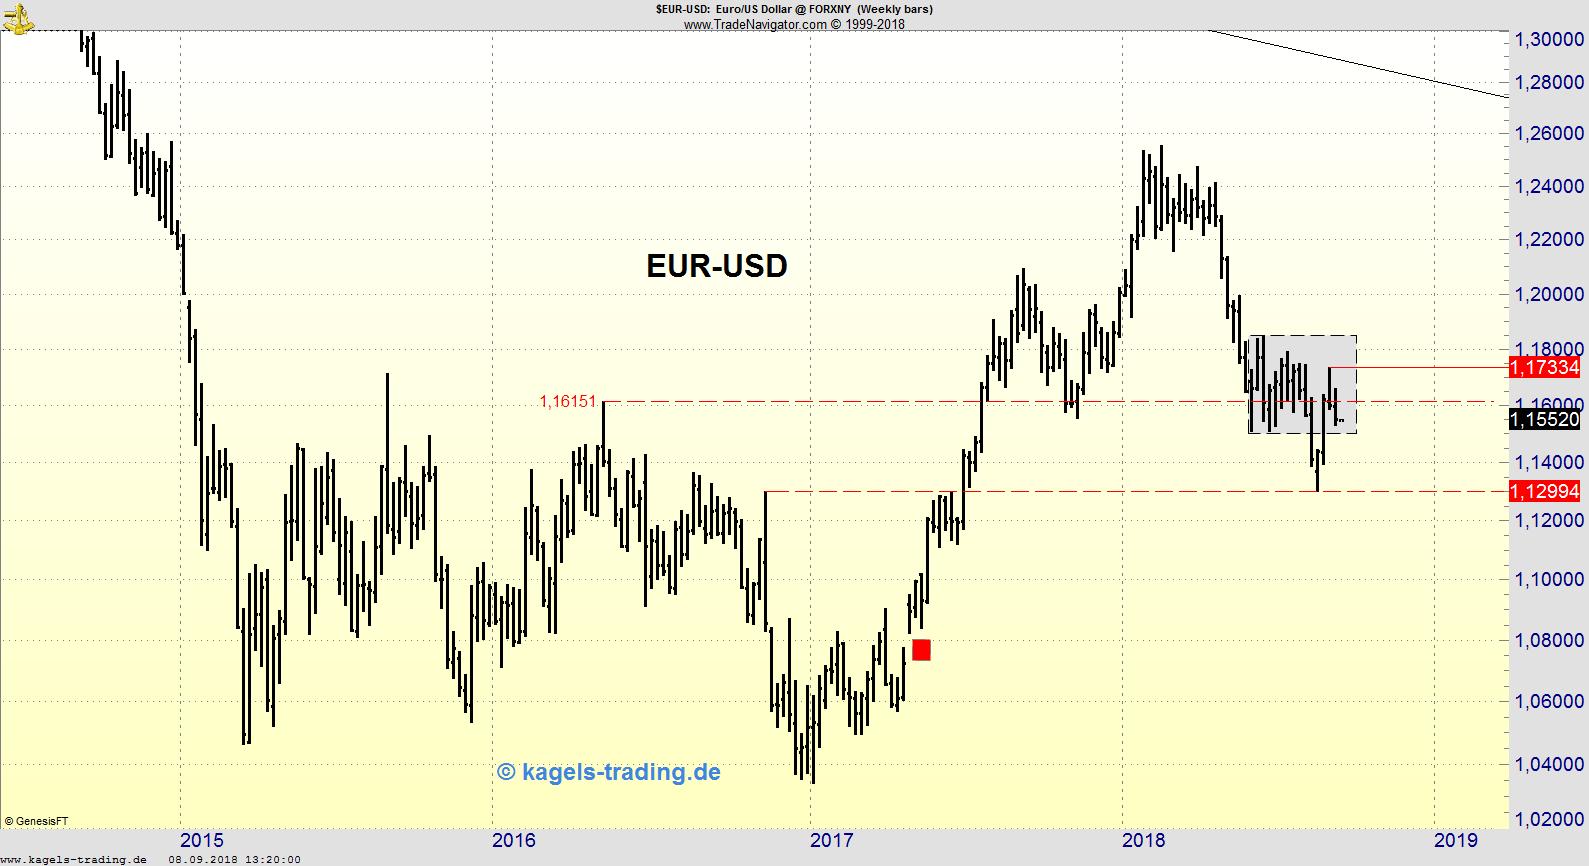 Wochenchart EUR/USD nahe Wochentief